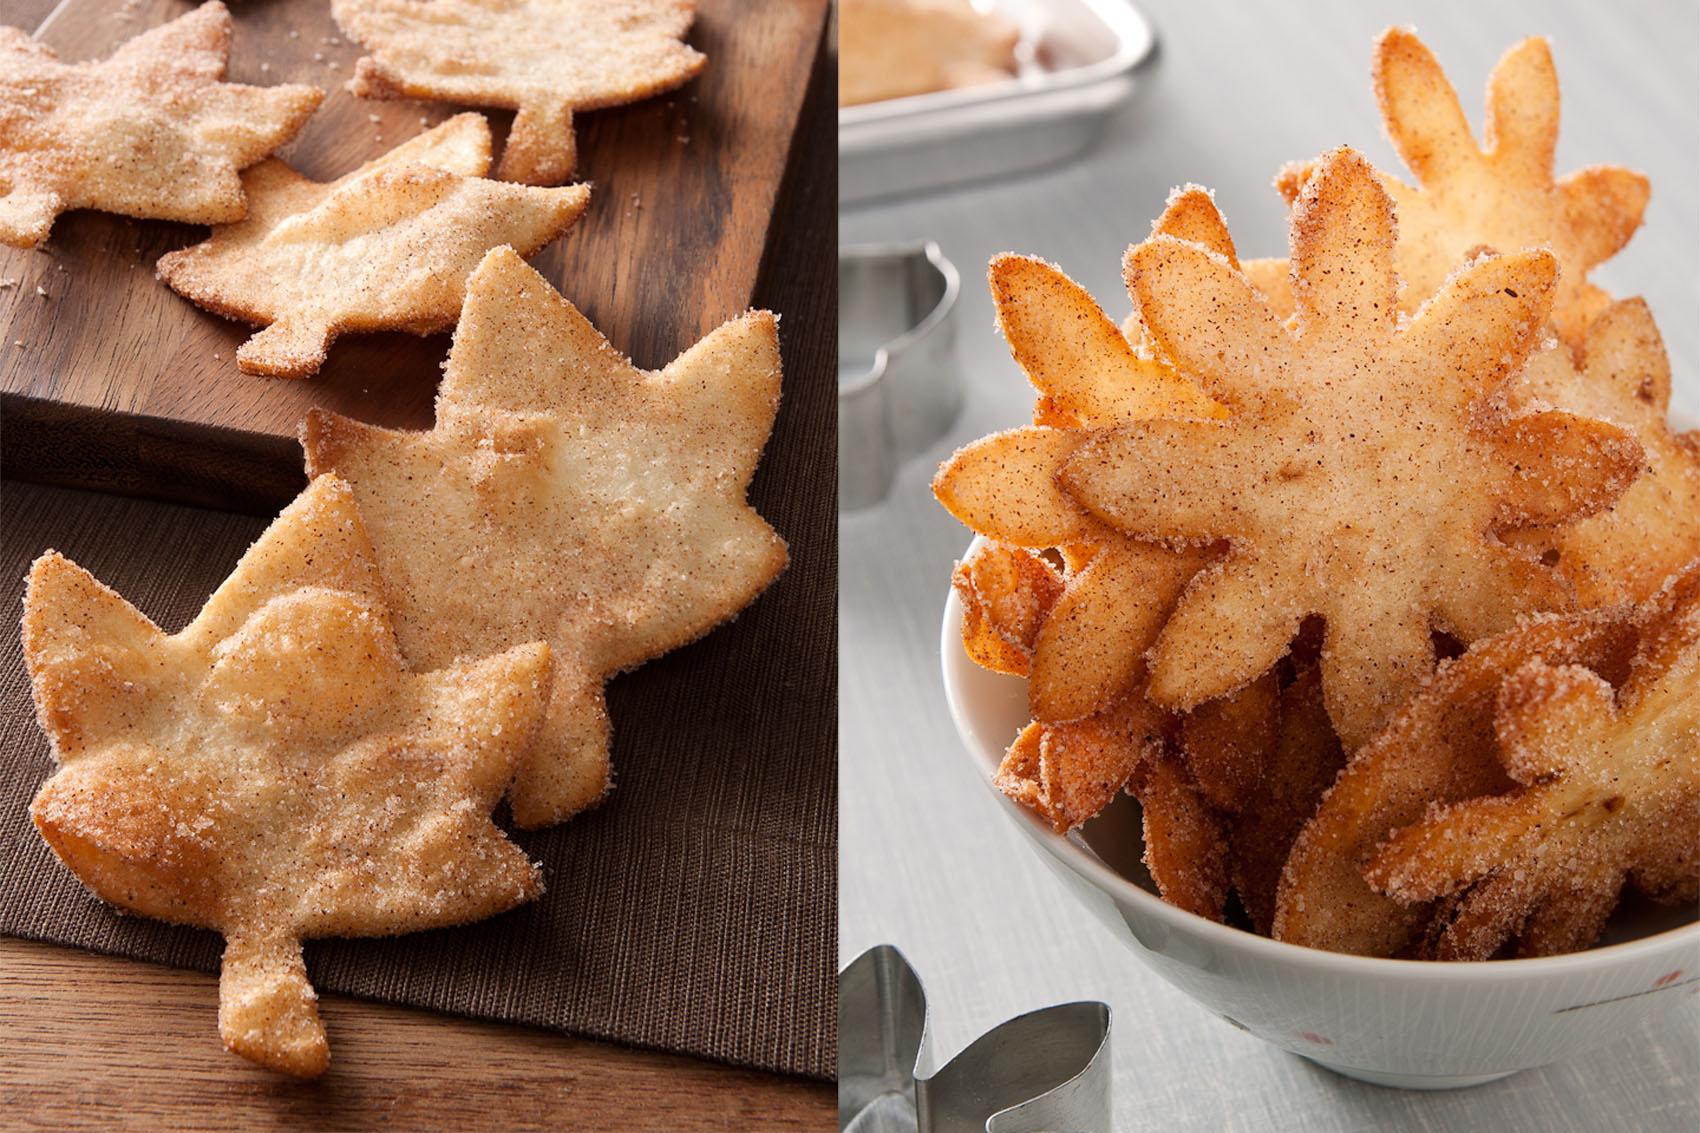 Fried Cinnamon Sugar Tortillas Amp My Love Of Fall I Bake